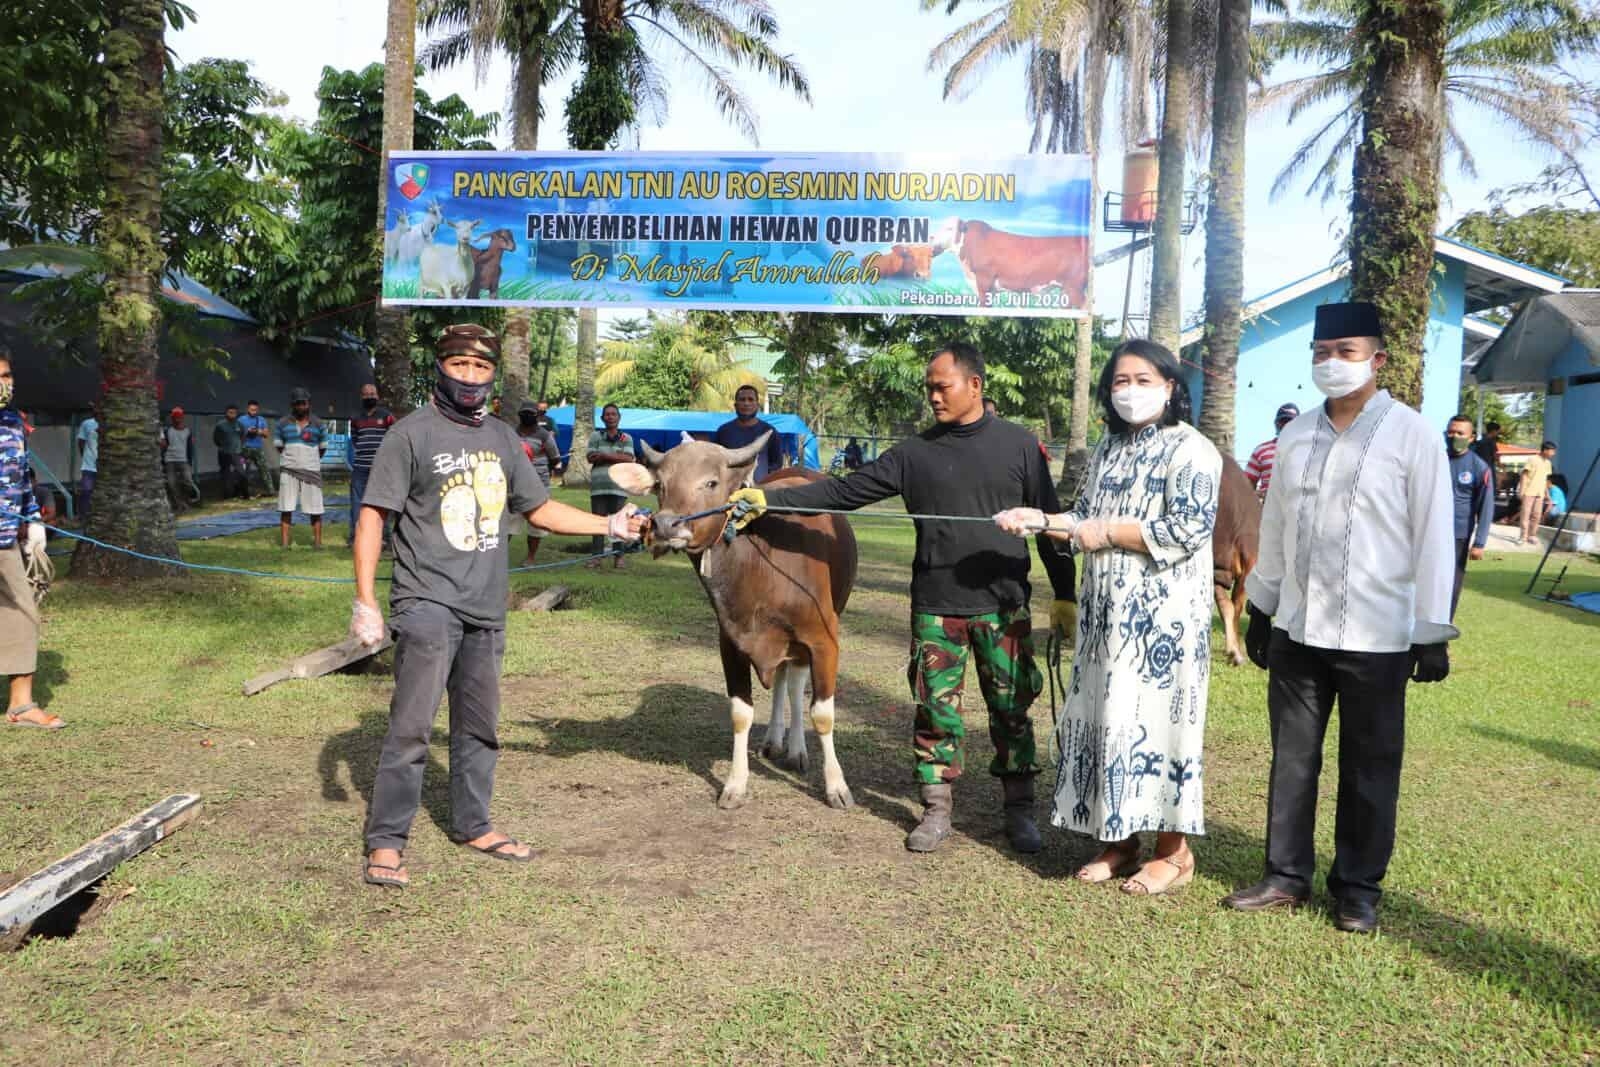 Ketua PIA Ardhya Garini Cab.12/D.I Lanud Roesmin Nurjadin Sumbang 1 Ekor Sapi